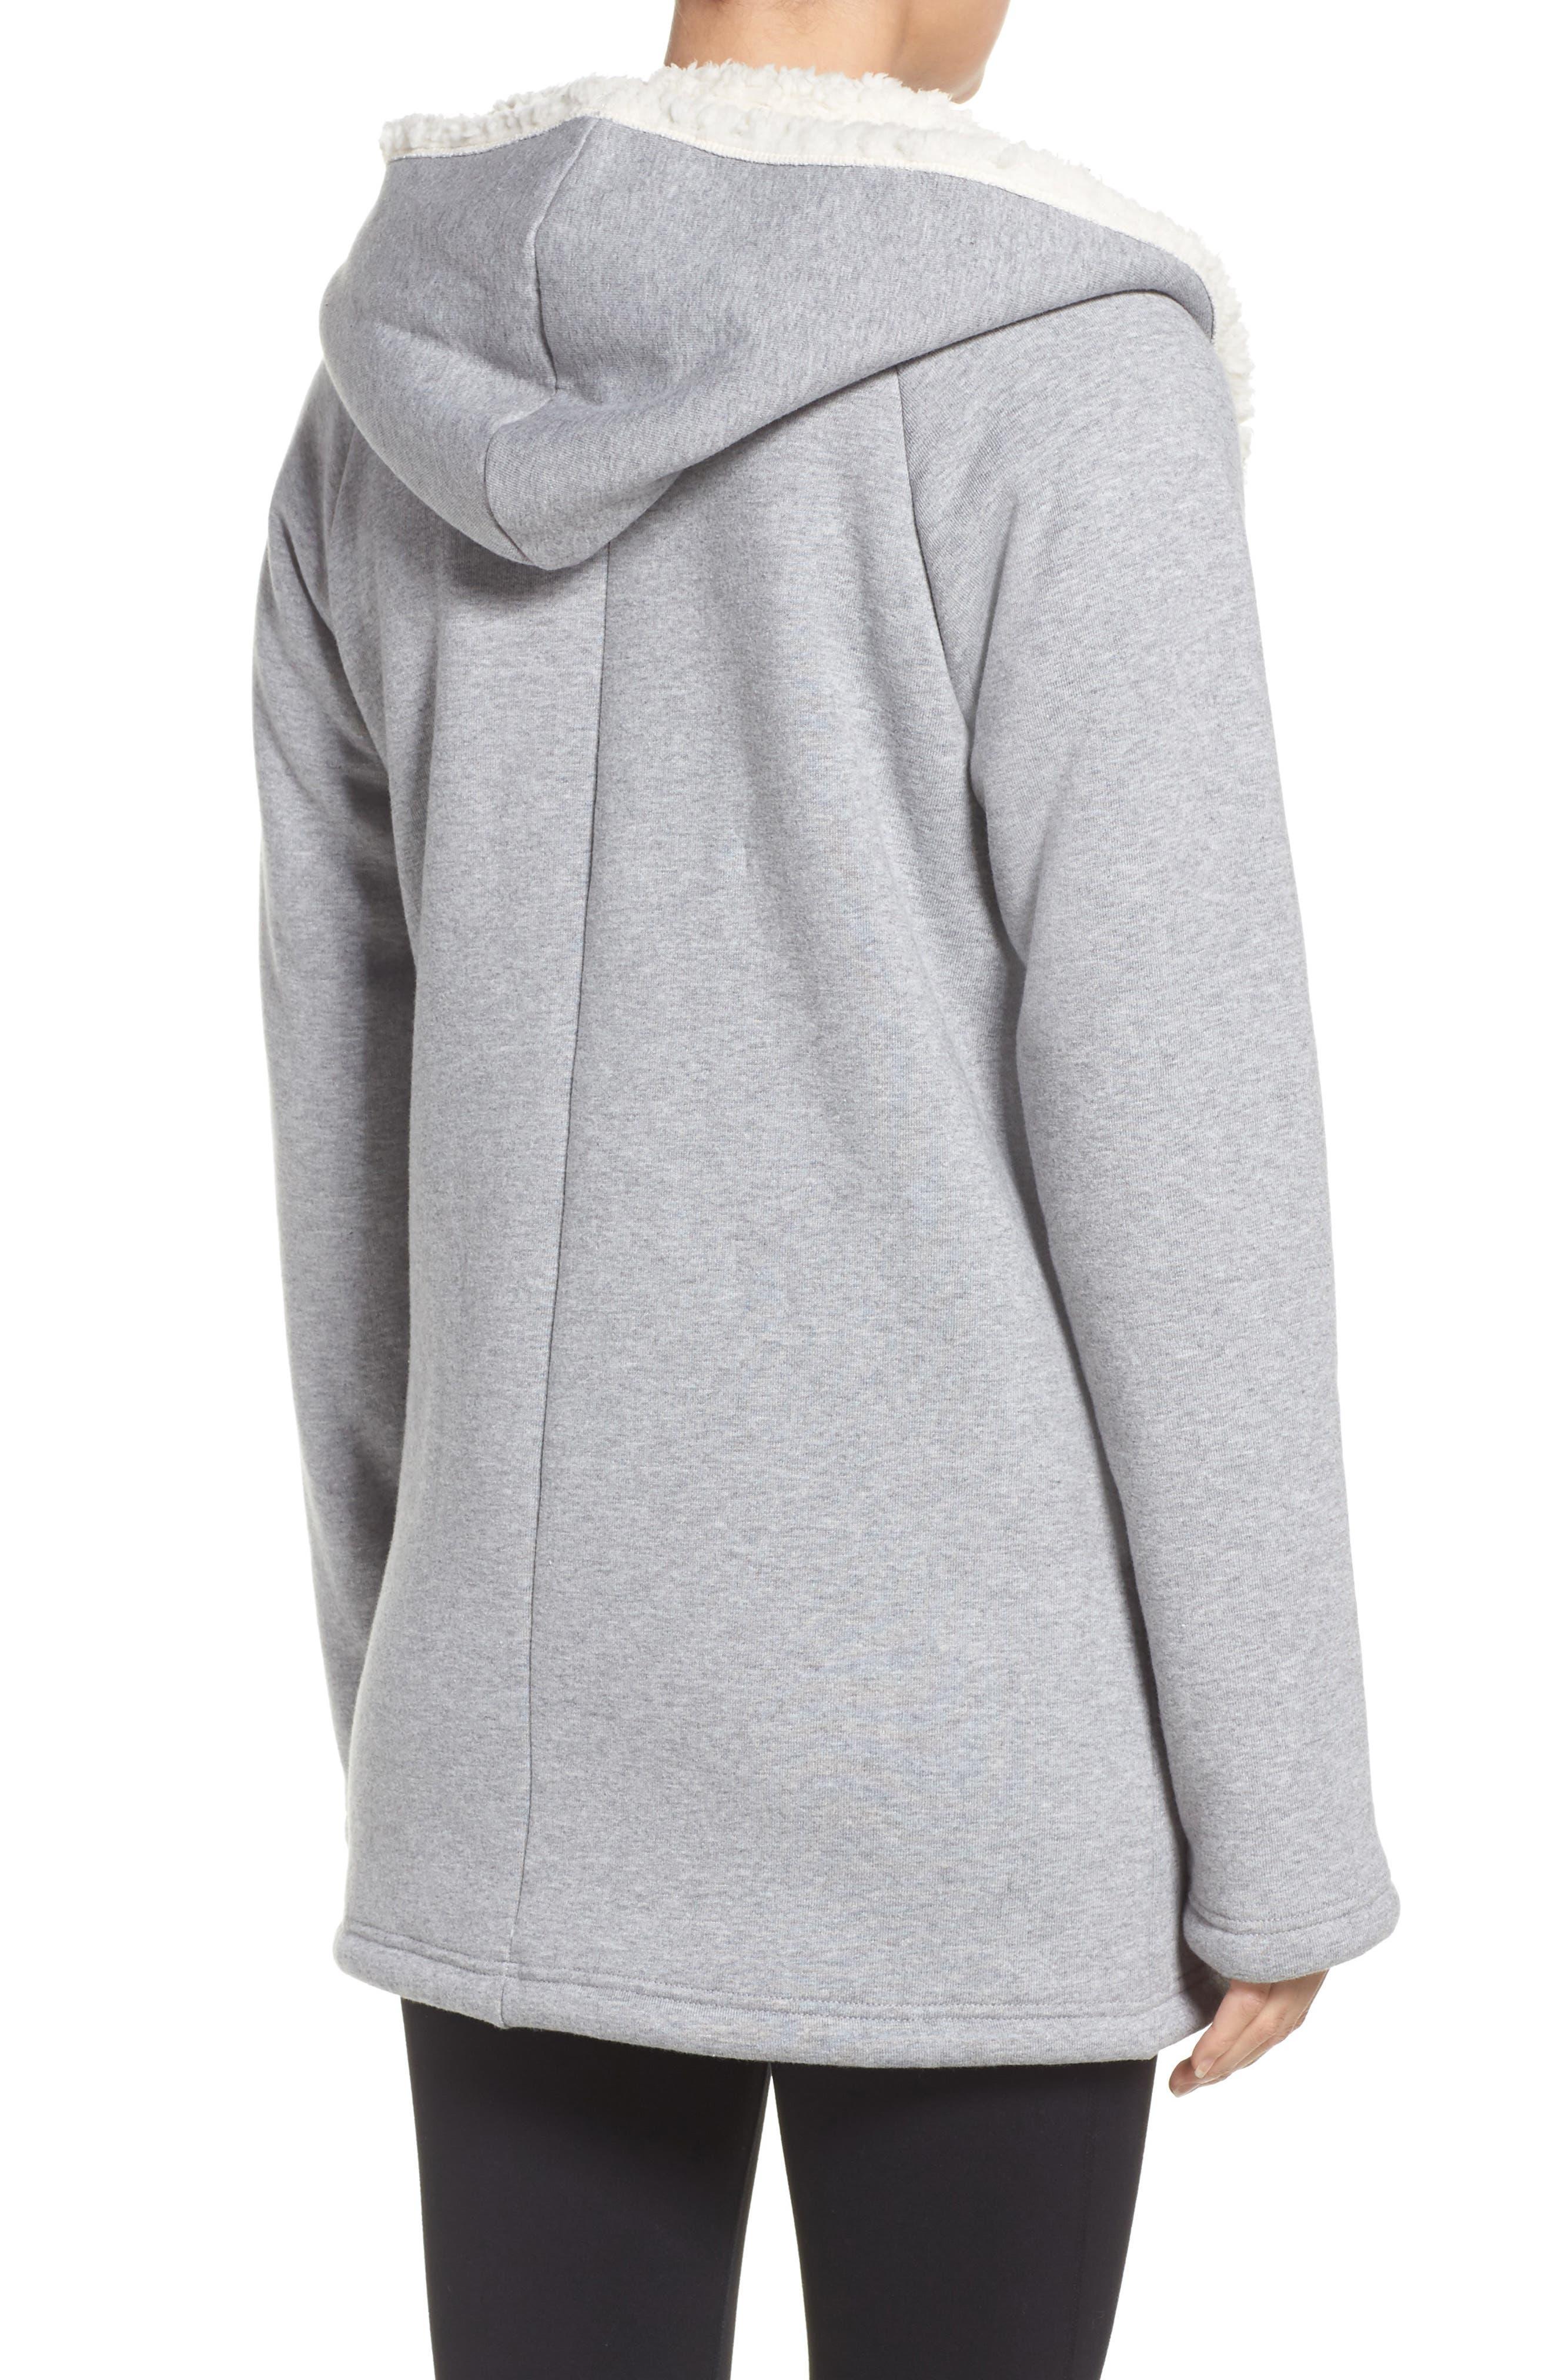 Chalet Fleece Lined Hooded Wrap,                             Alternate thumbnail 2, color,                             030